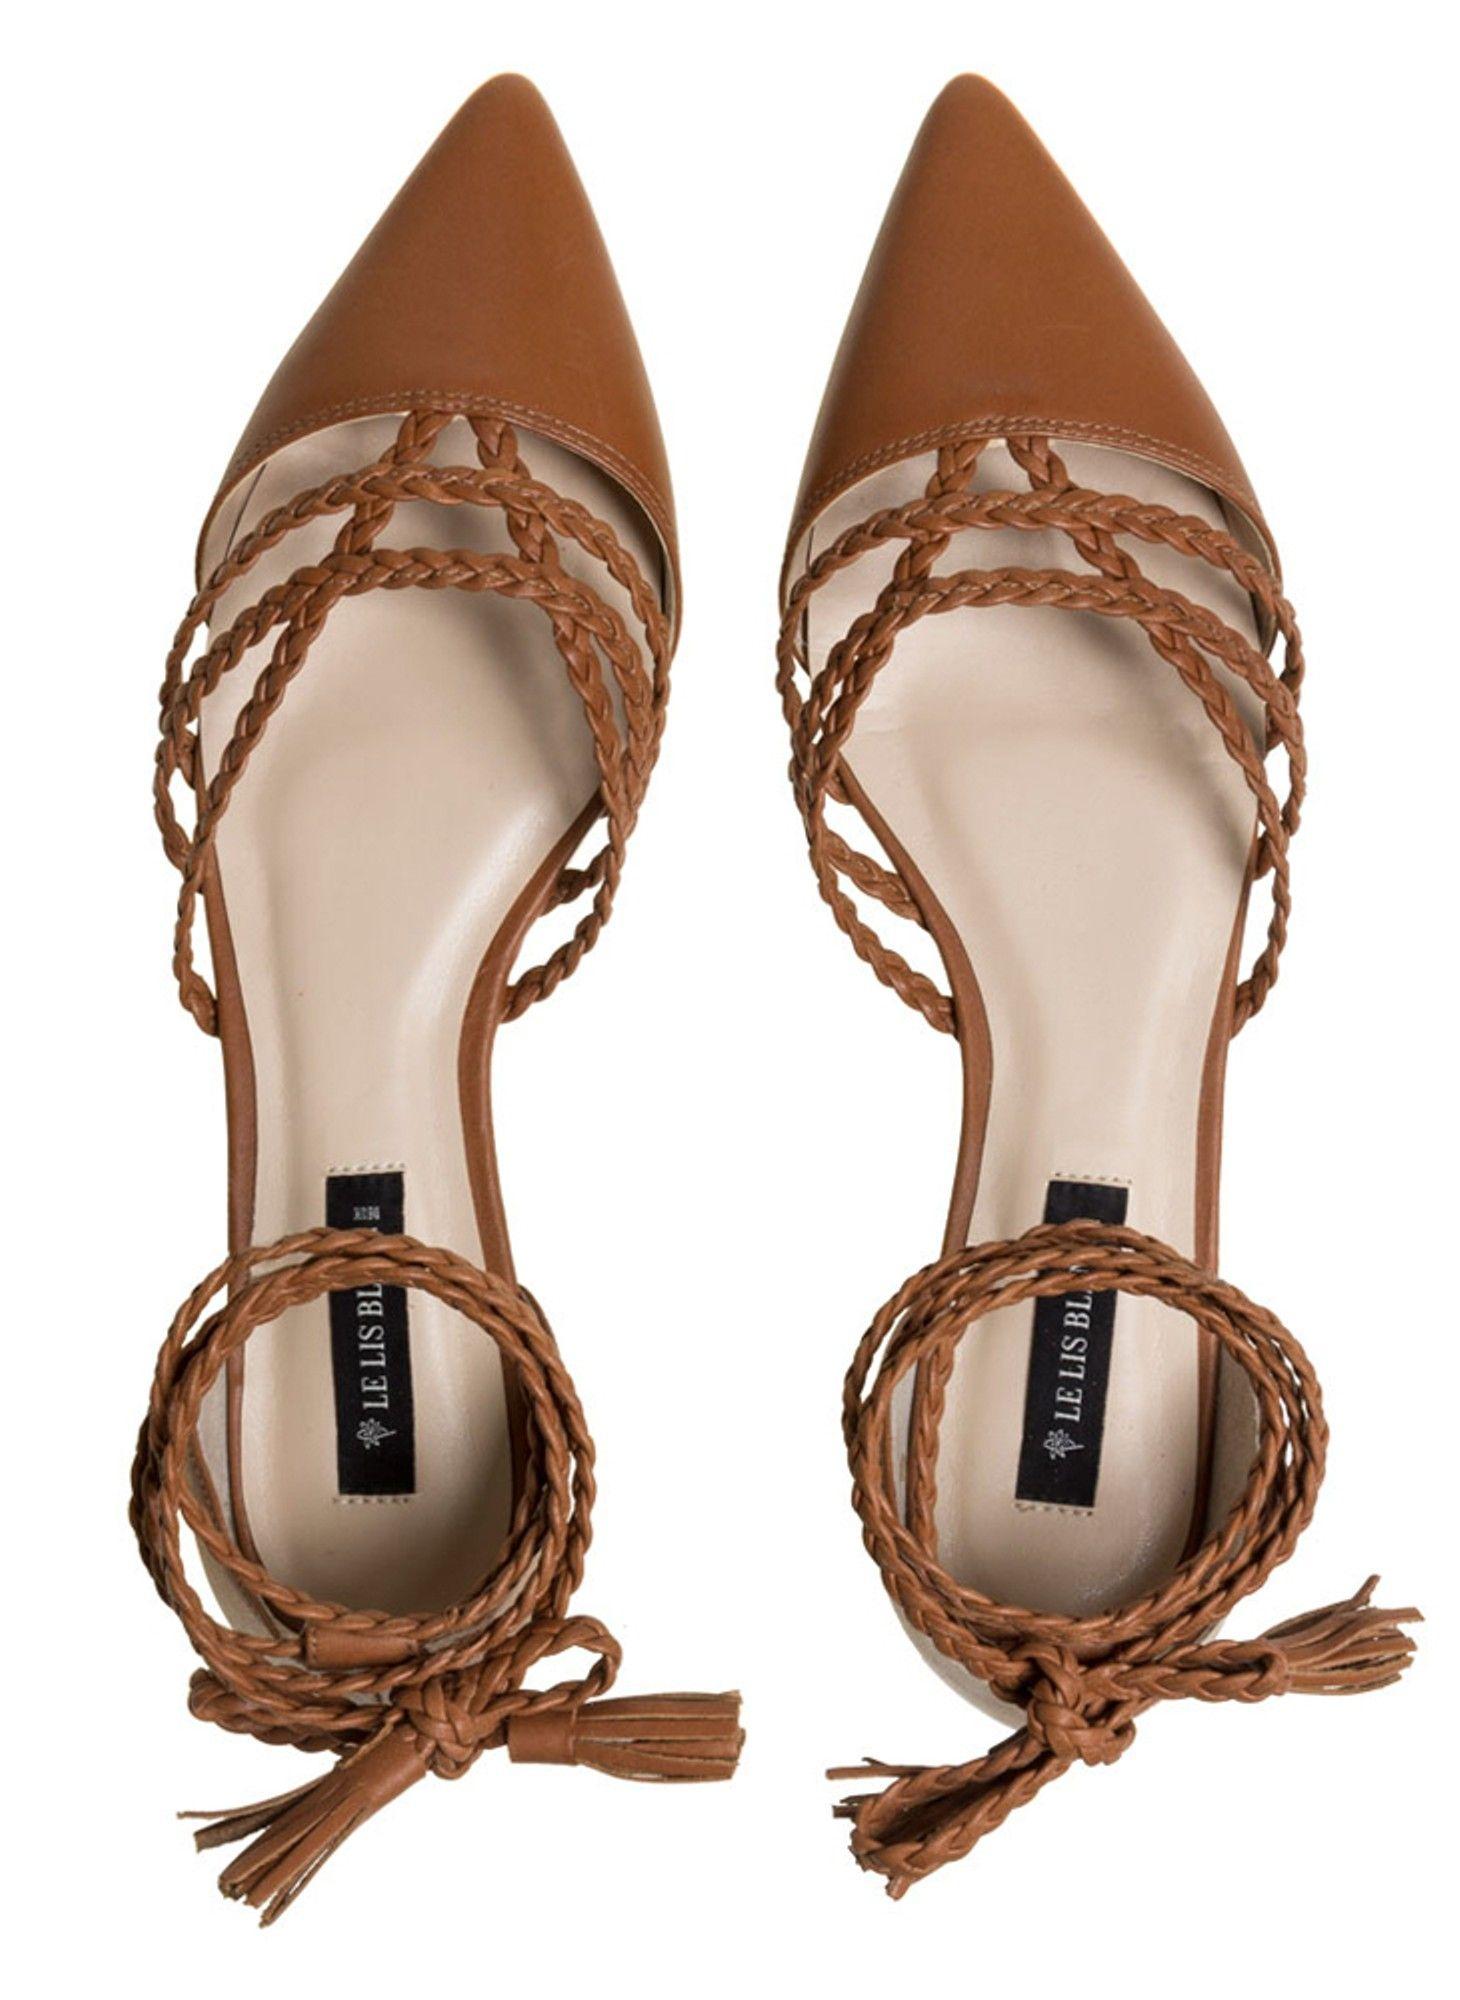 Sapatilha Anne Couro - lelis Sapatos De Couro Feminino, Sapatilha De Couro,  Sapatos Confortáveis adef415601